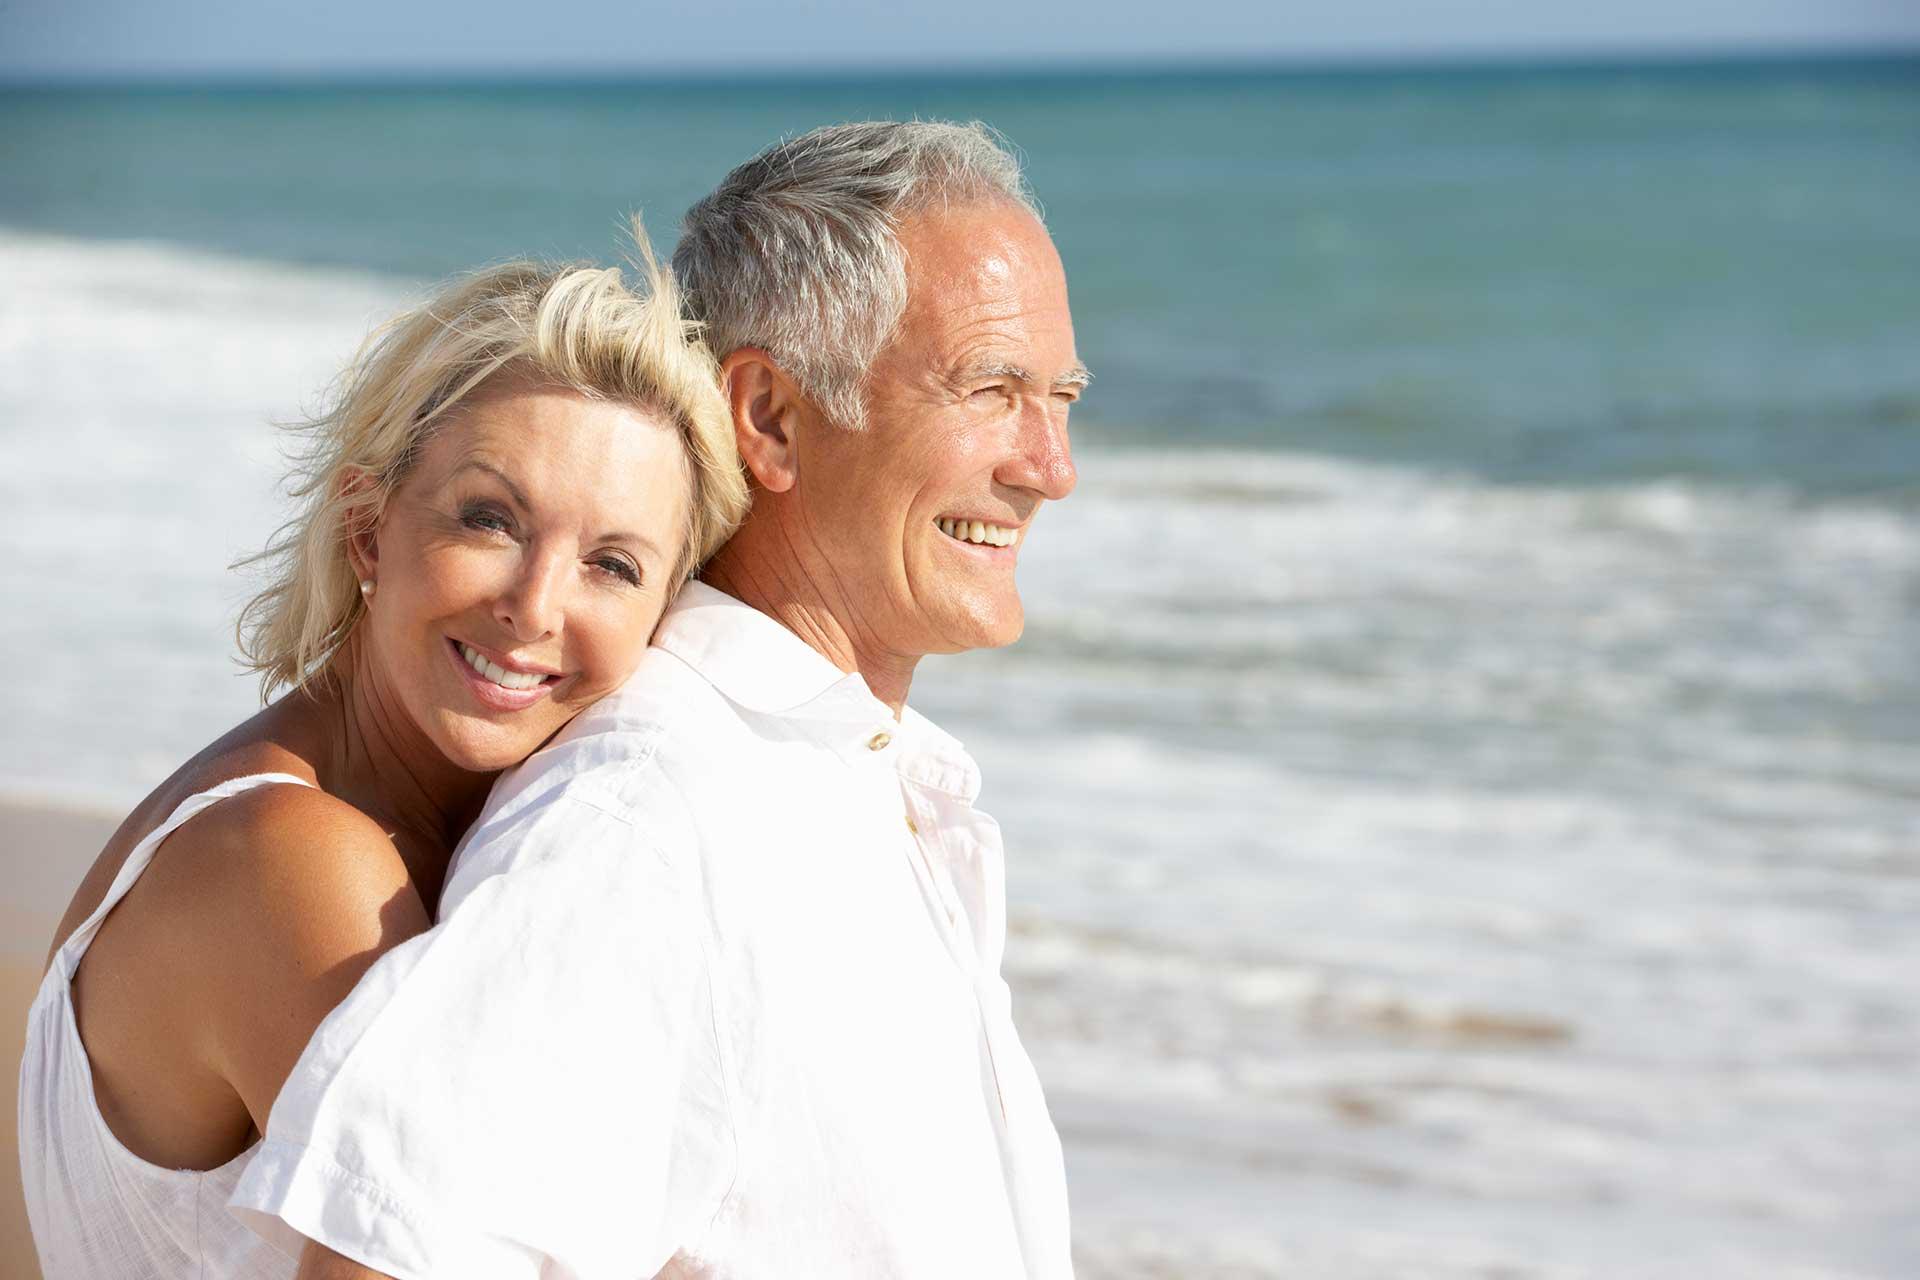 husband and wife enjoying the beach together